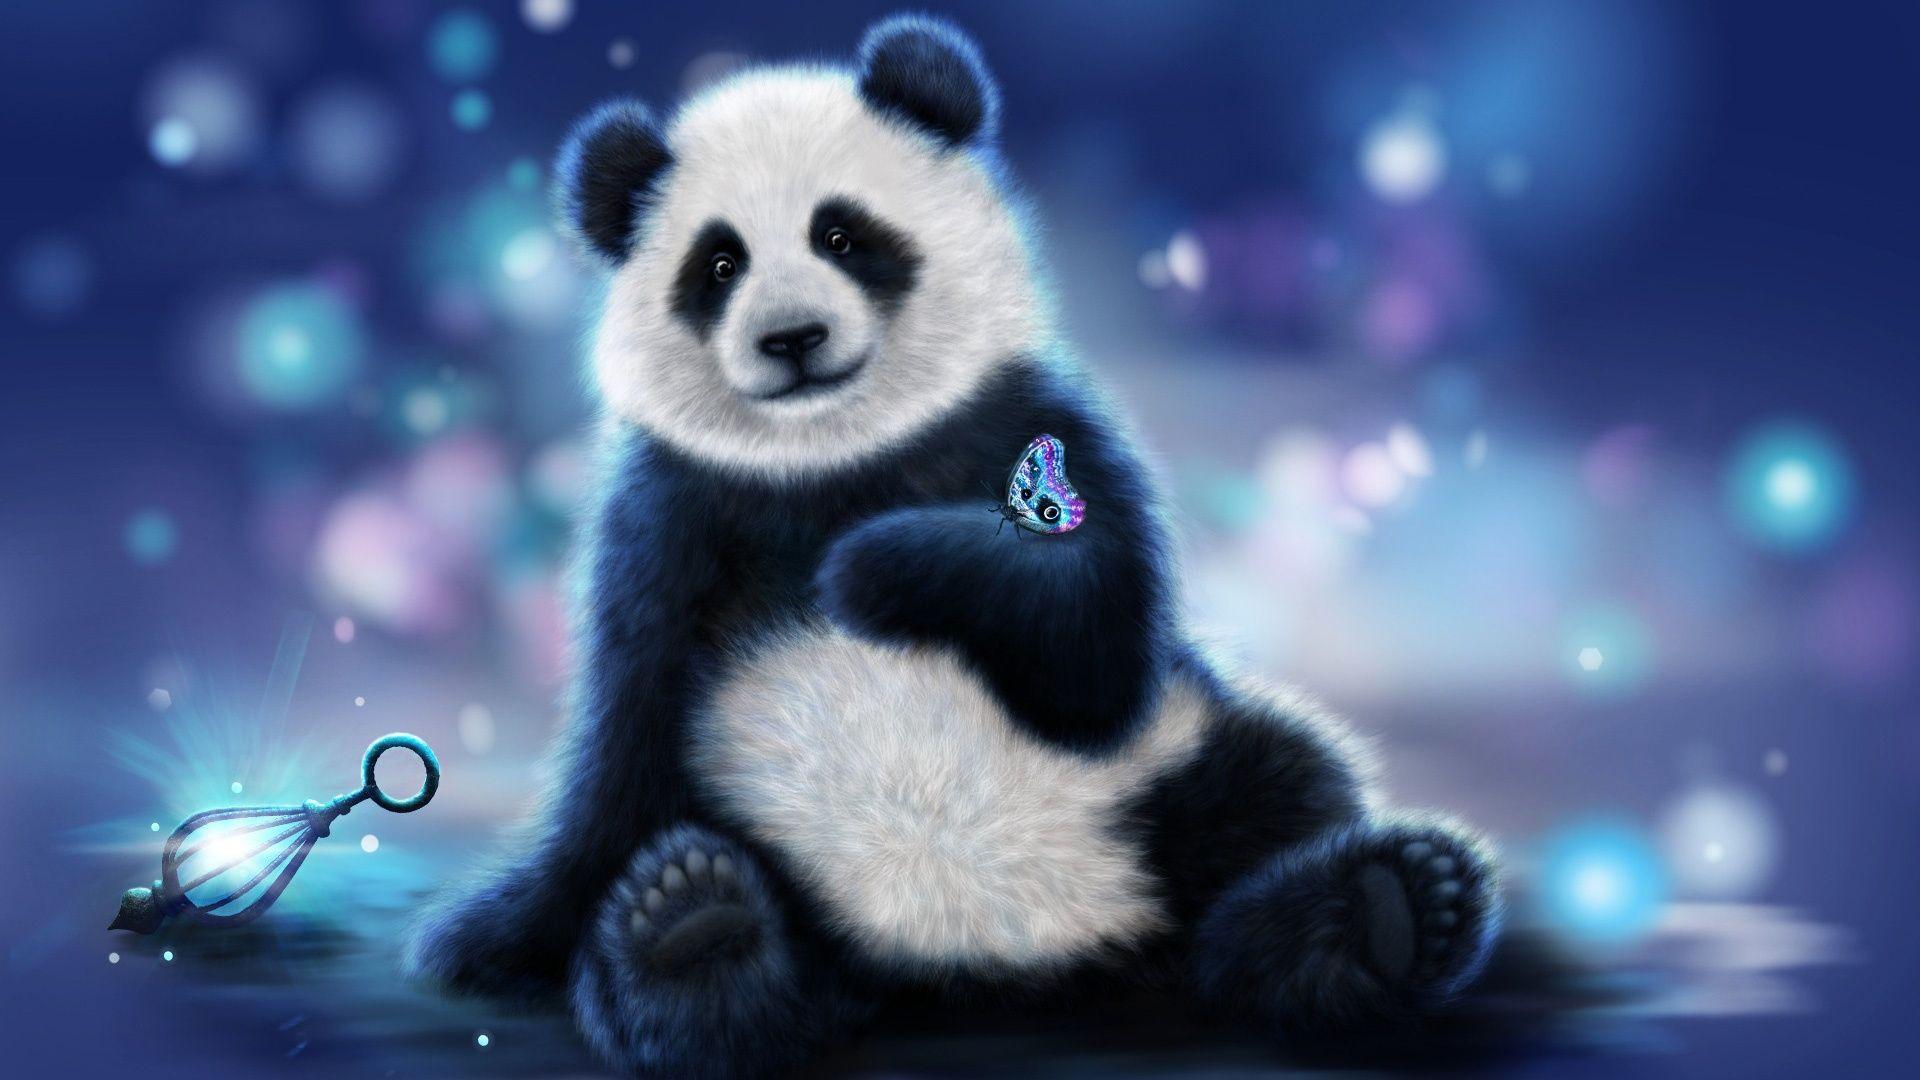 Panda Bear Pictures